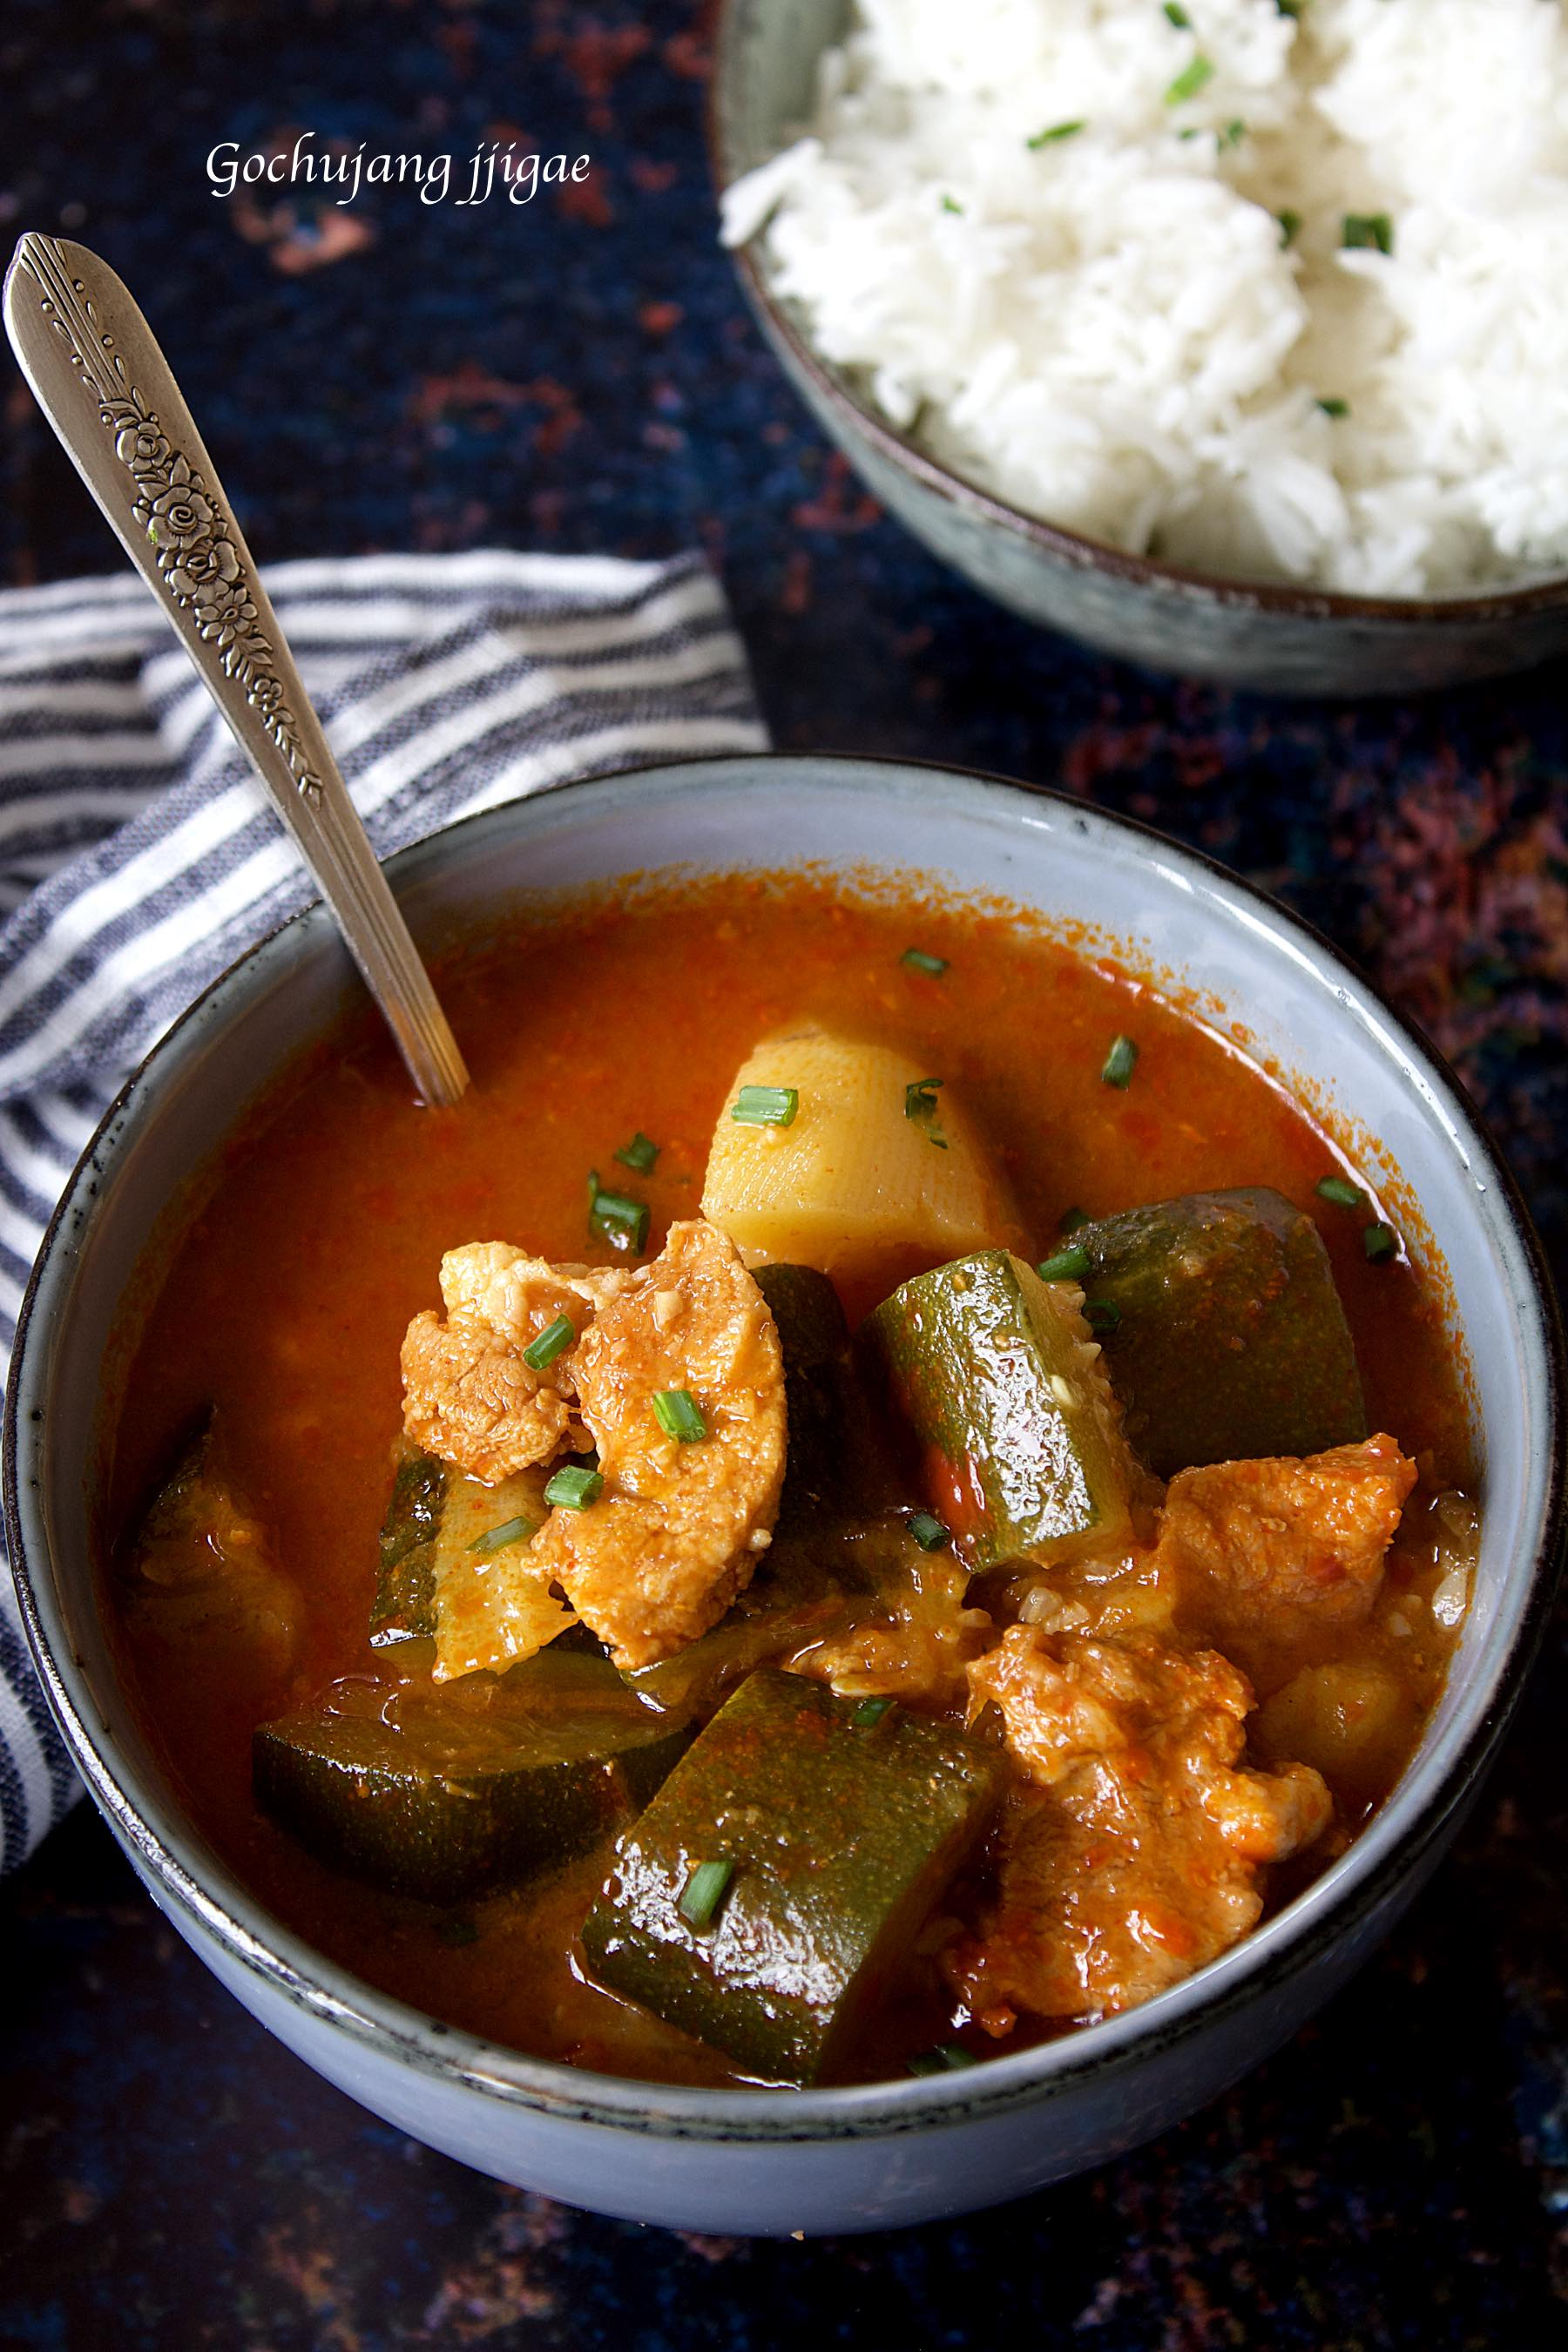 Gochujang jjigae, Korean pork and vegetables stew